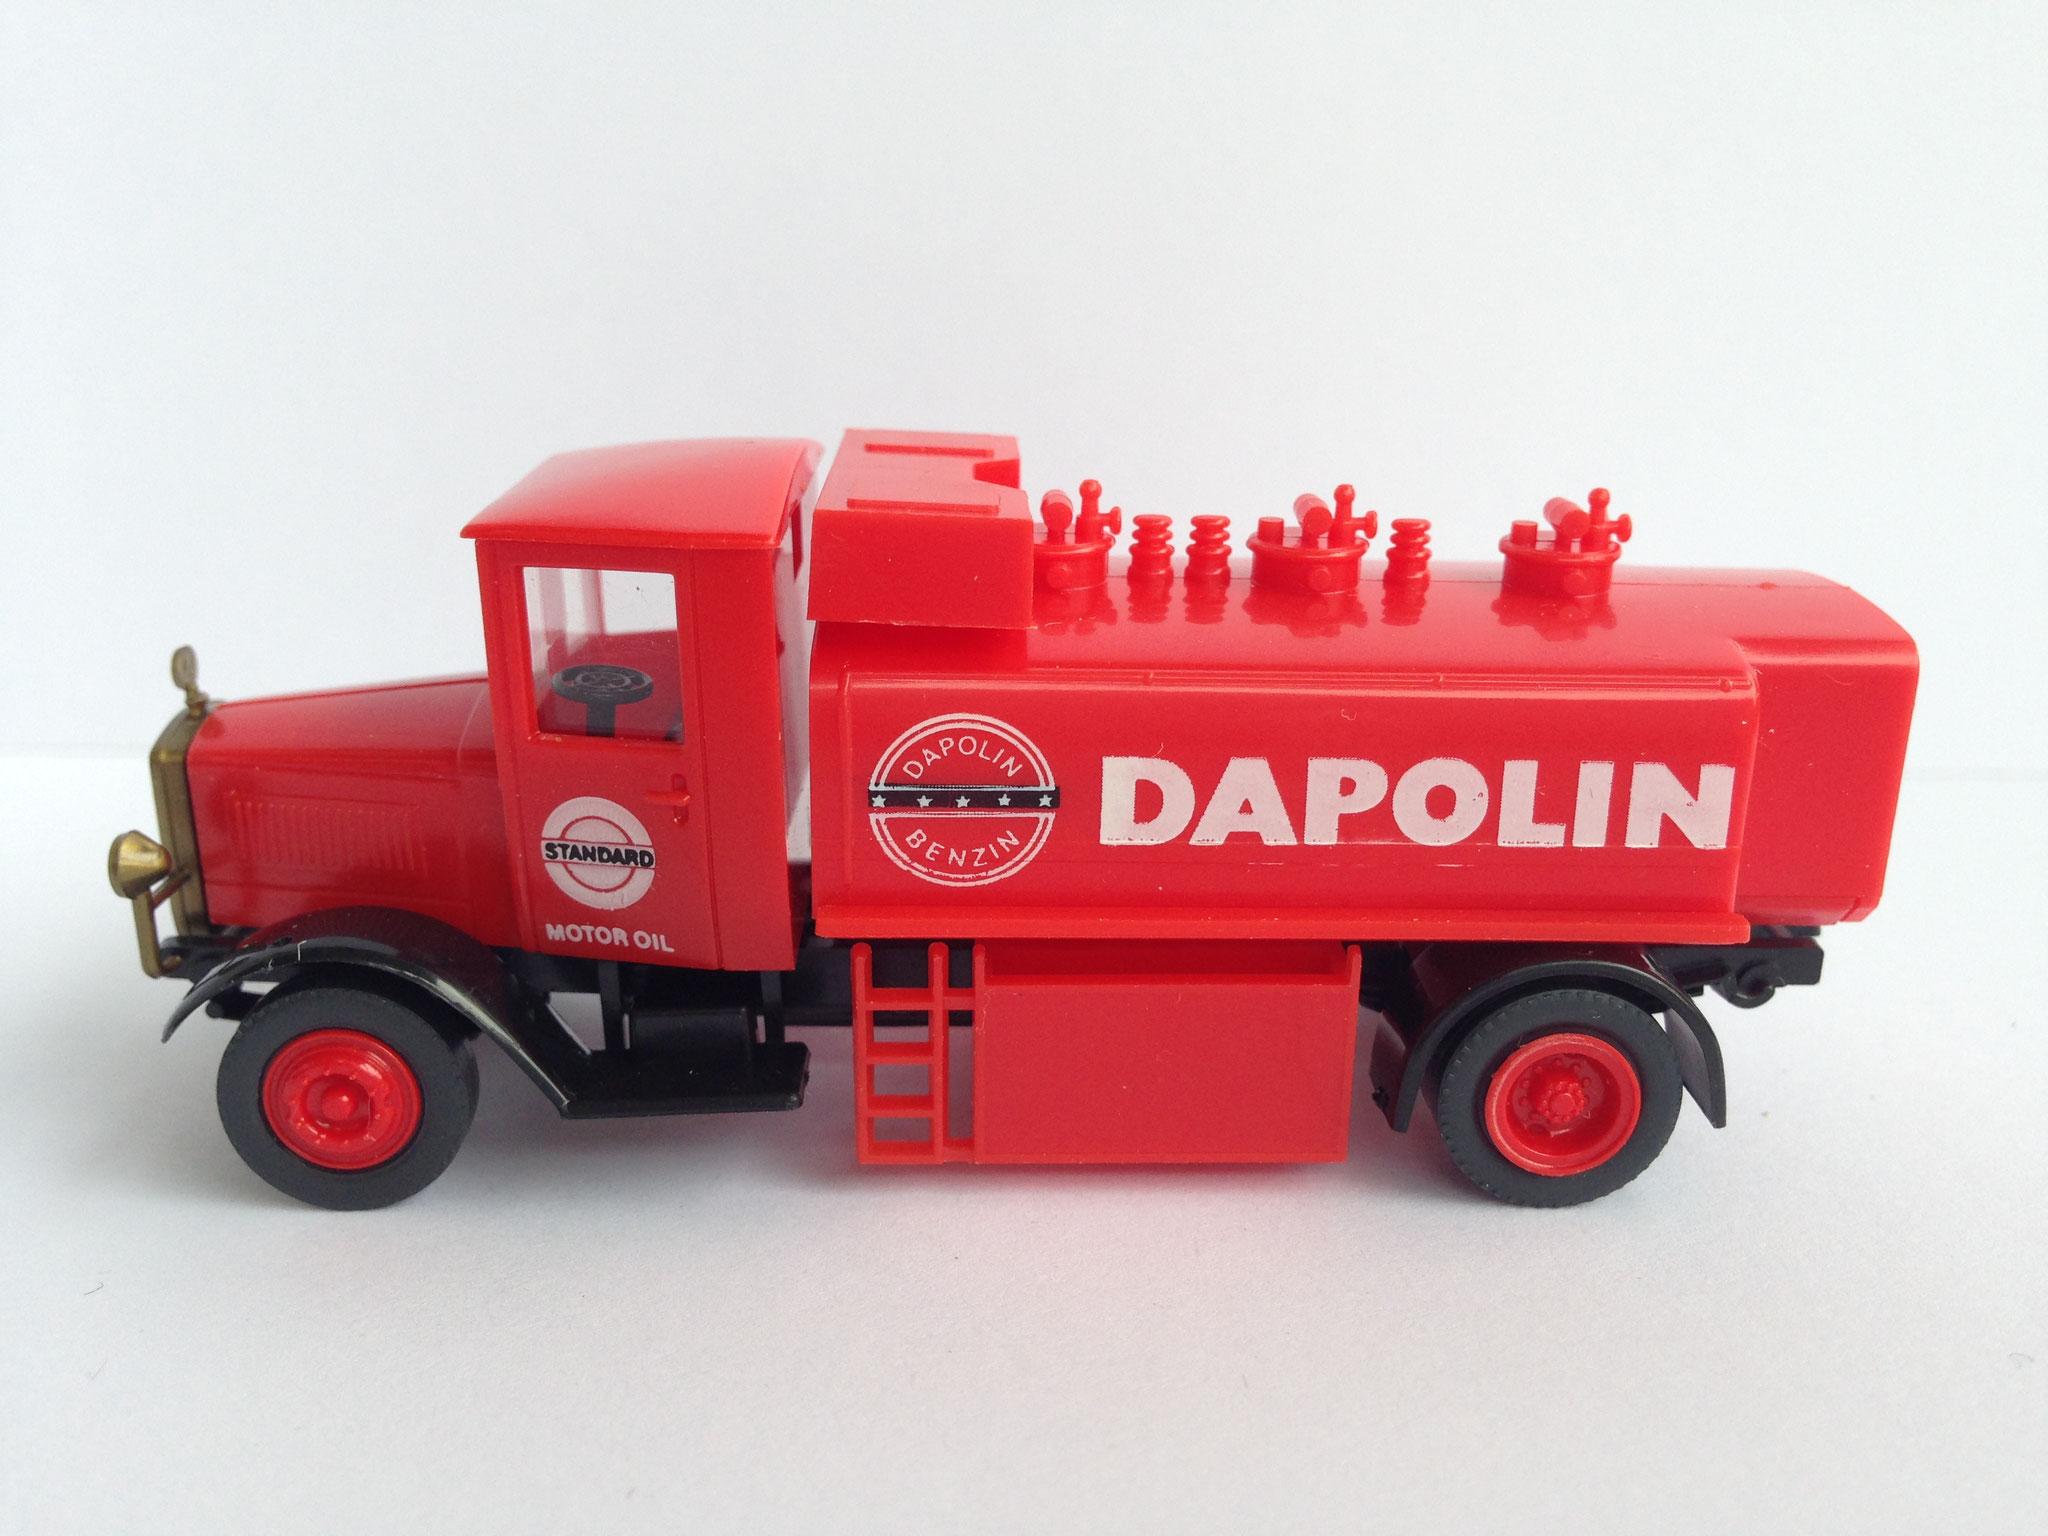 Mercedes L5 Tankwagen Dapolin, Art. Nr. 1041 (ab 1990 im Programm)